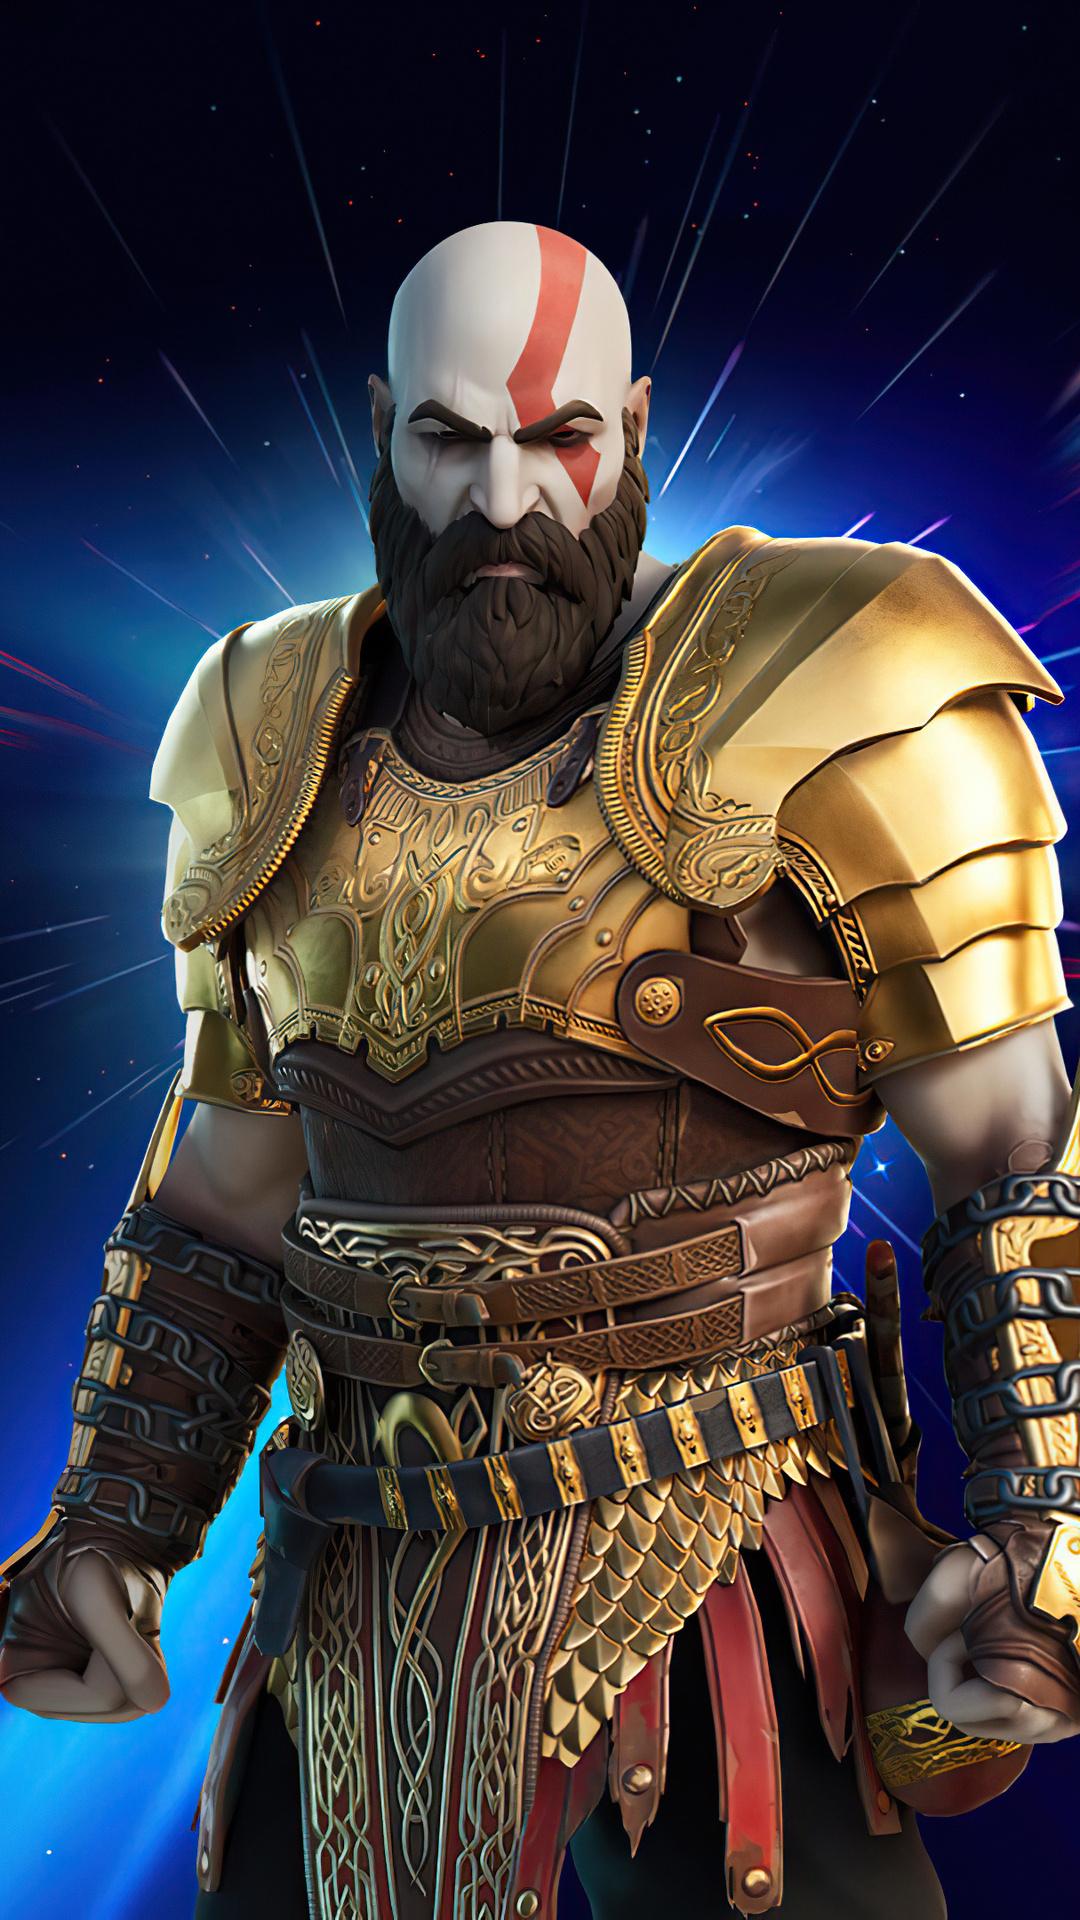 kratos-in-fortnite-chapter-2-season-5-4k-x7.jpg